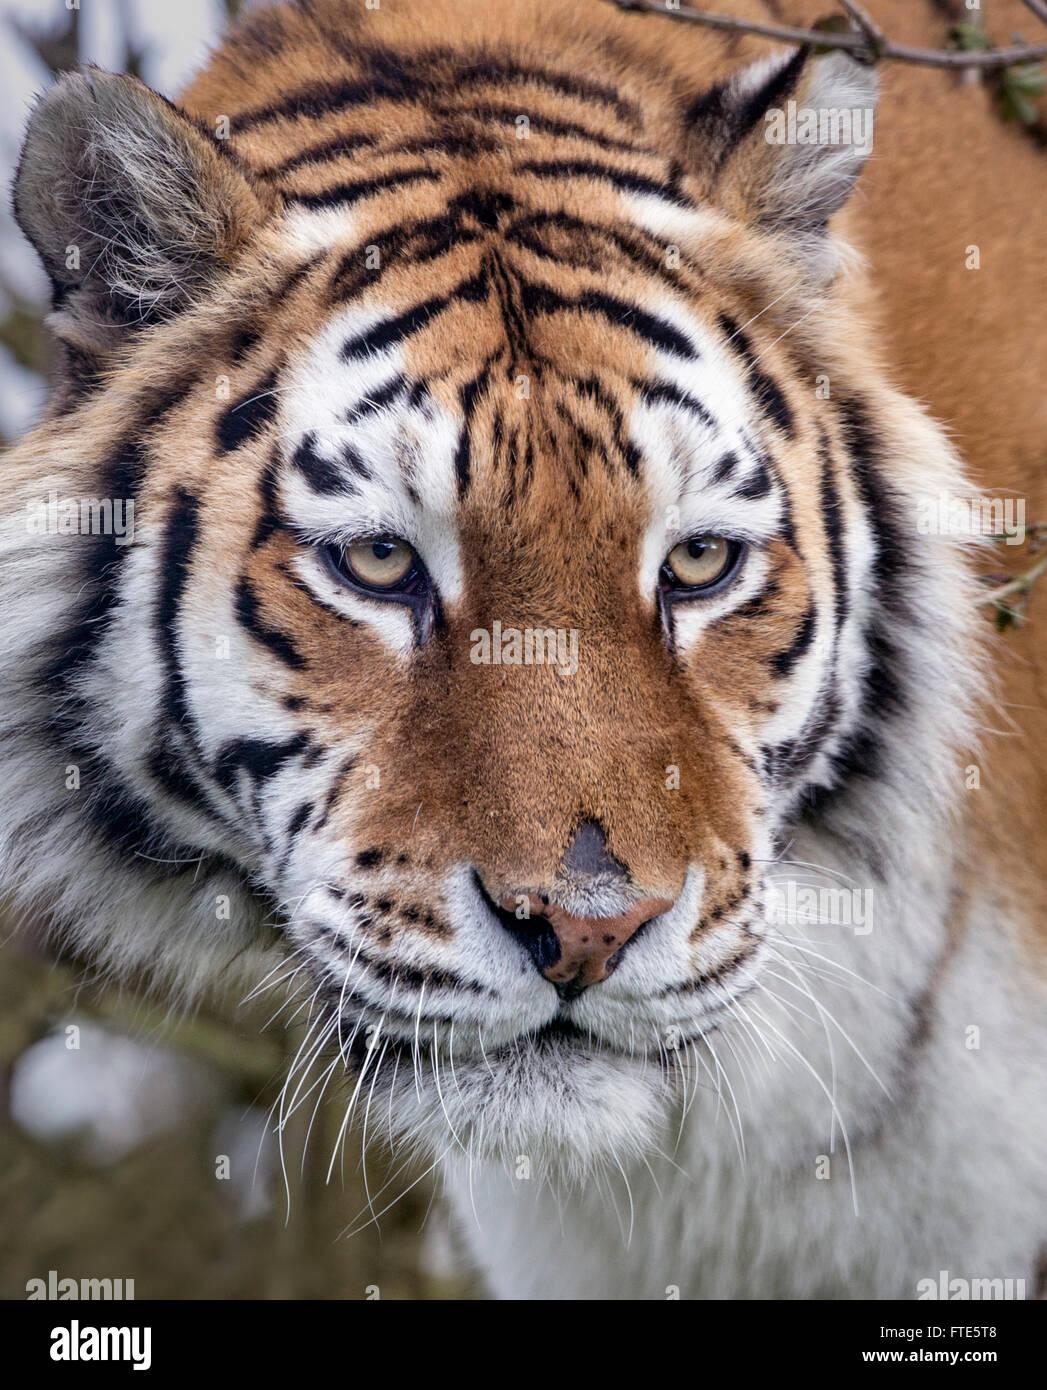 Tiger Face Stock Photos & Tiger Face Stock Images - Alamy